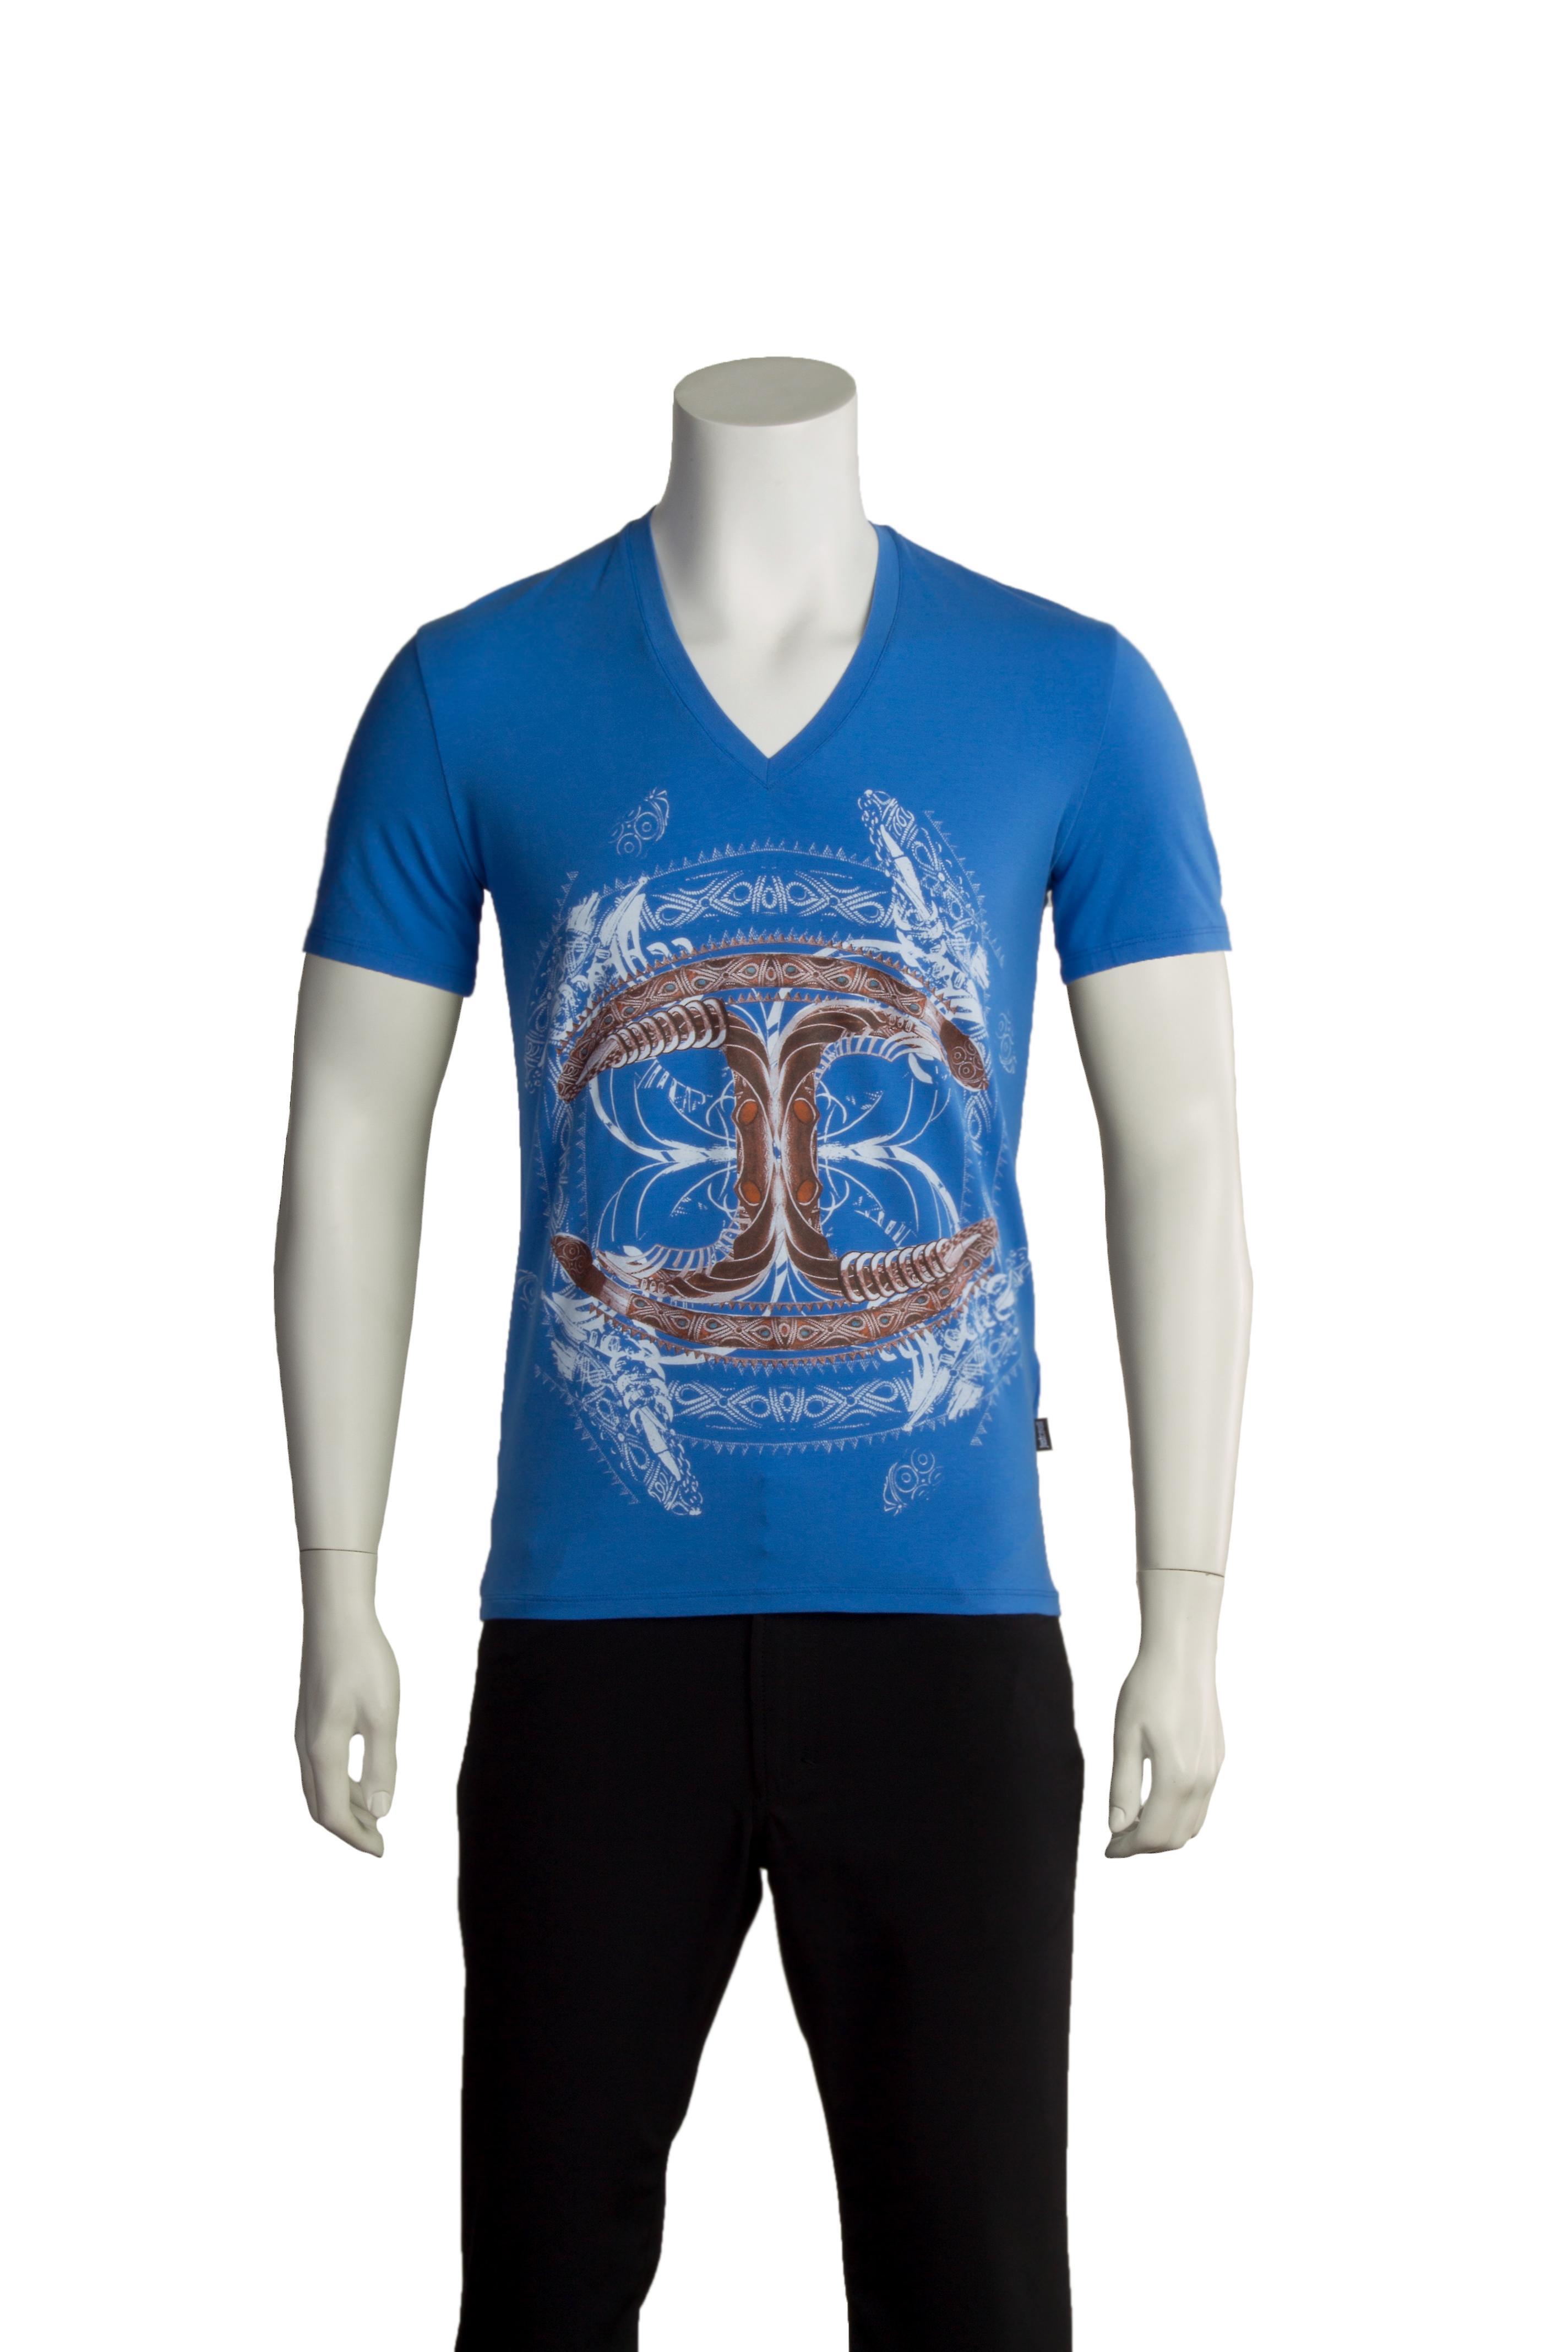 Just Cavalli Men Cultured V-Neck Shirt Blue